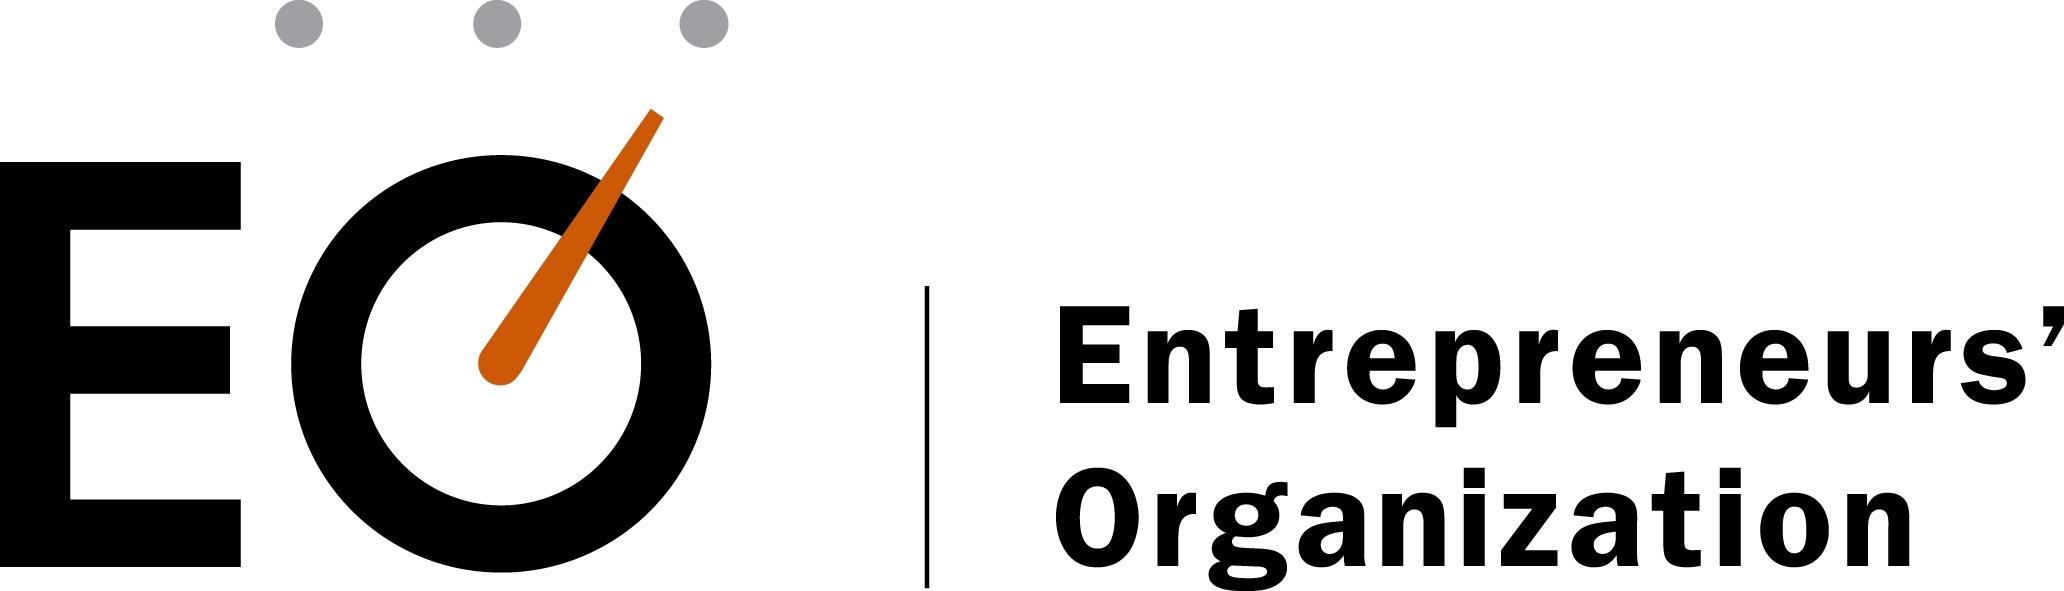 Entrepreneurs-Organization.jpg